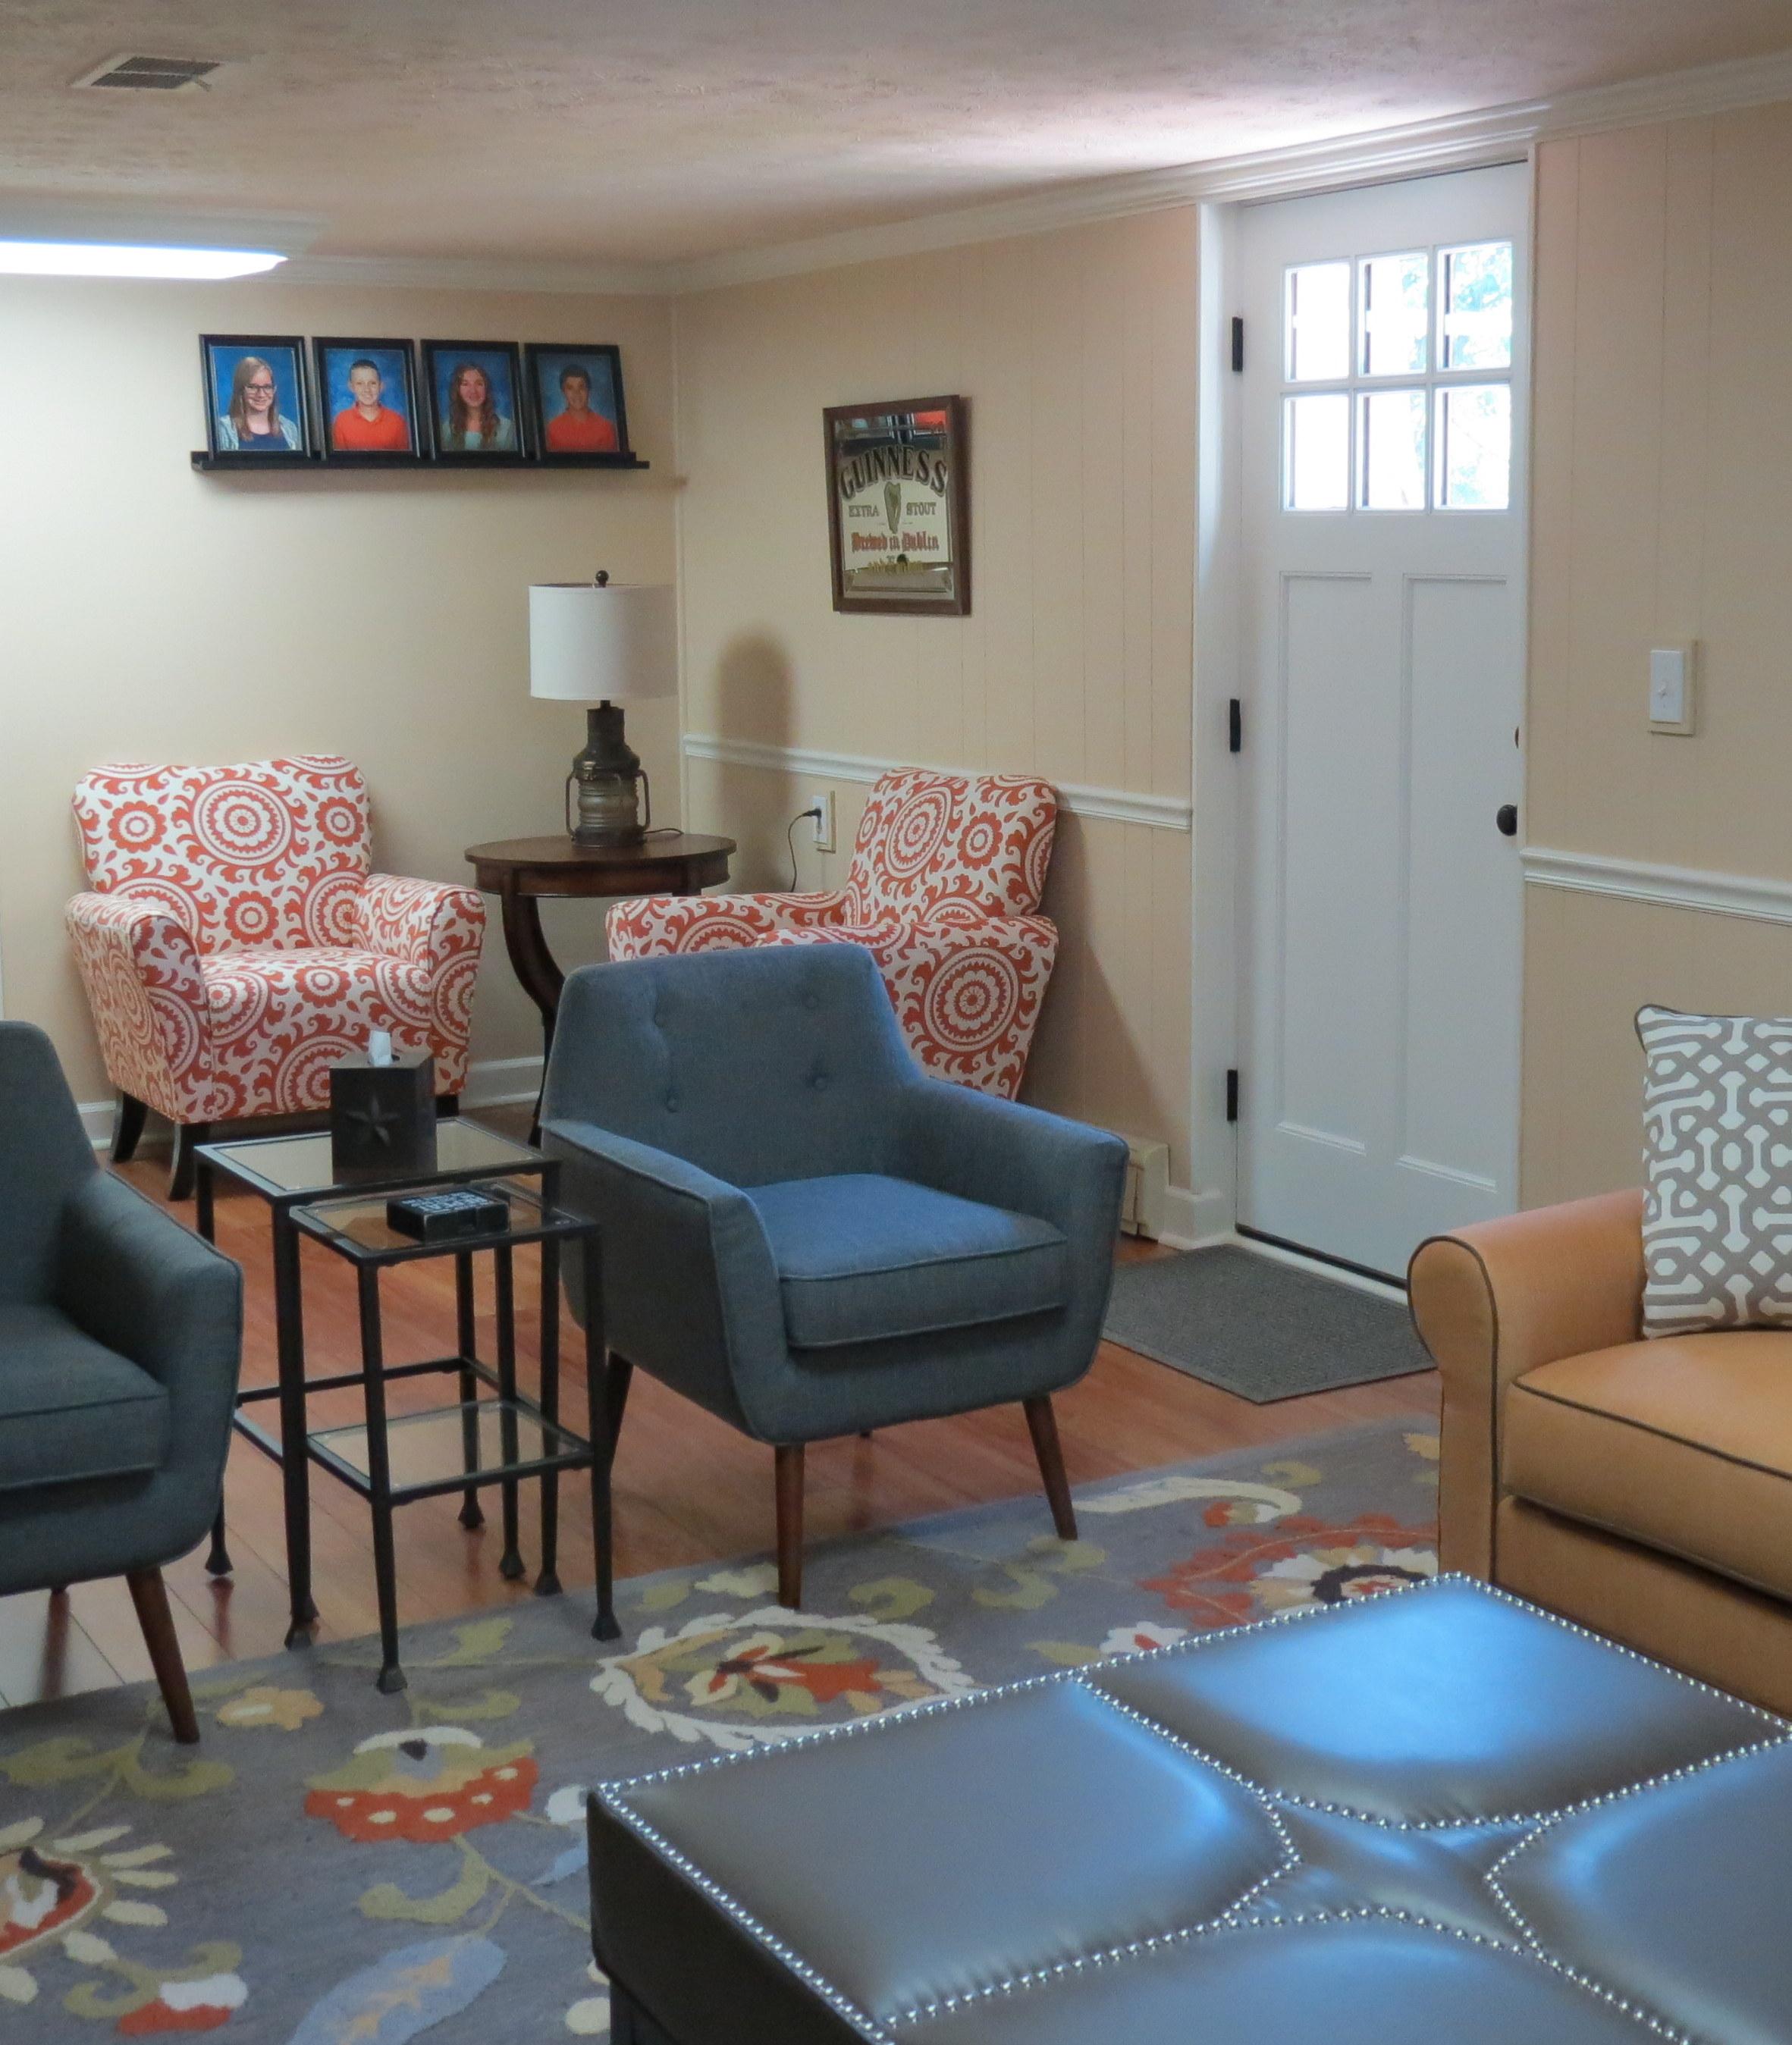 Cleveland interior design portfolio and services - Affordable interior design services ...